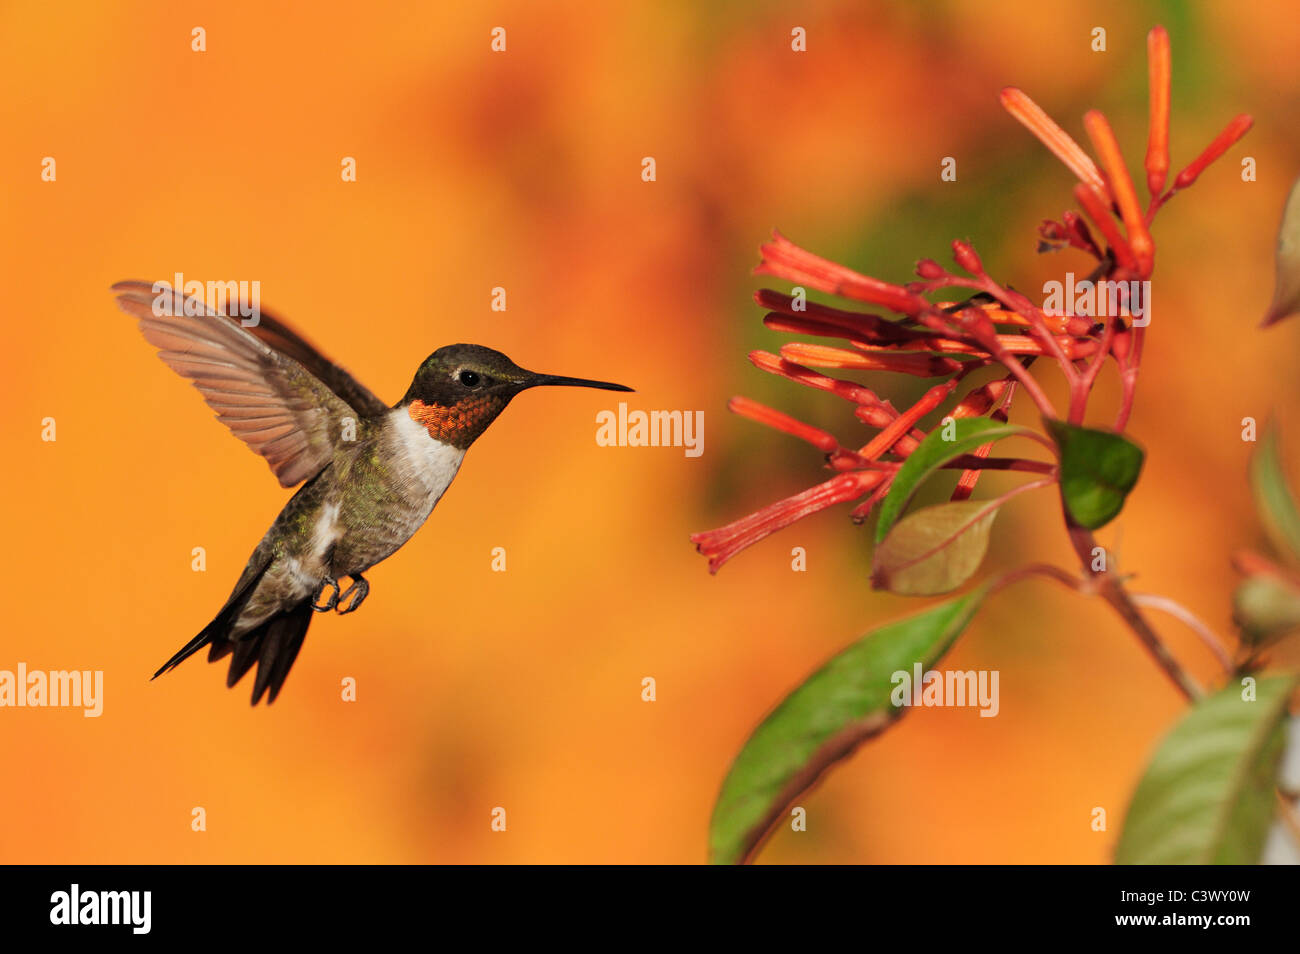 Ruby-throated Hummingbird (Archilochus colubris), macho en vuelo se alimentan en Firebush (Hamelia patens) Flor, Imagen De Stock